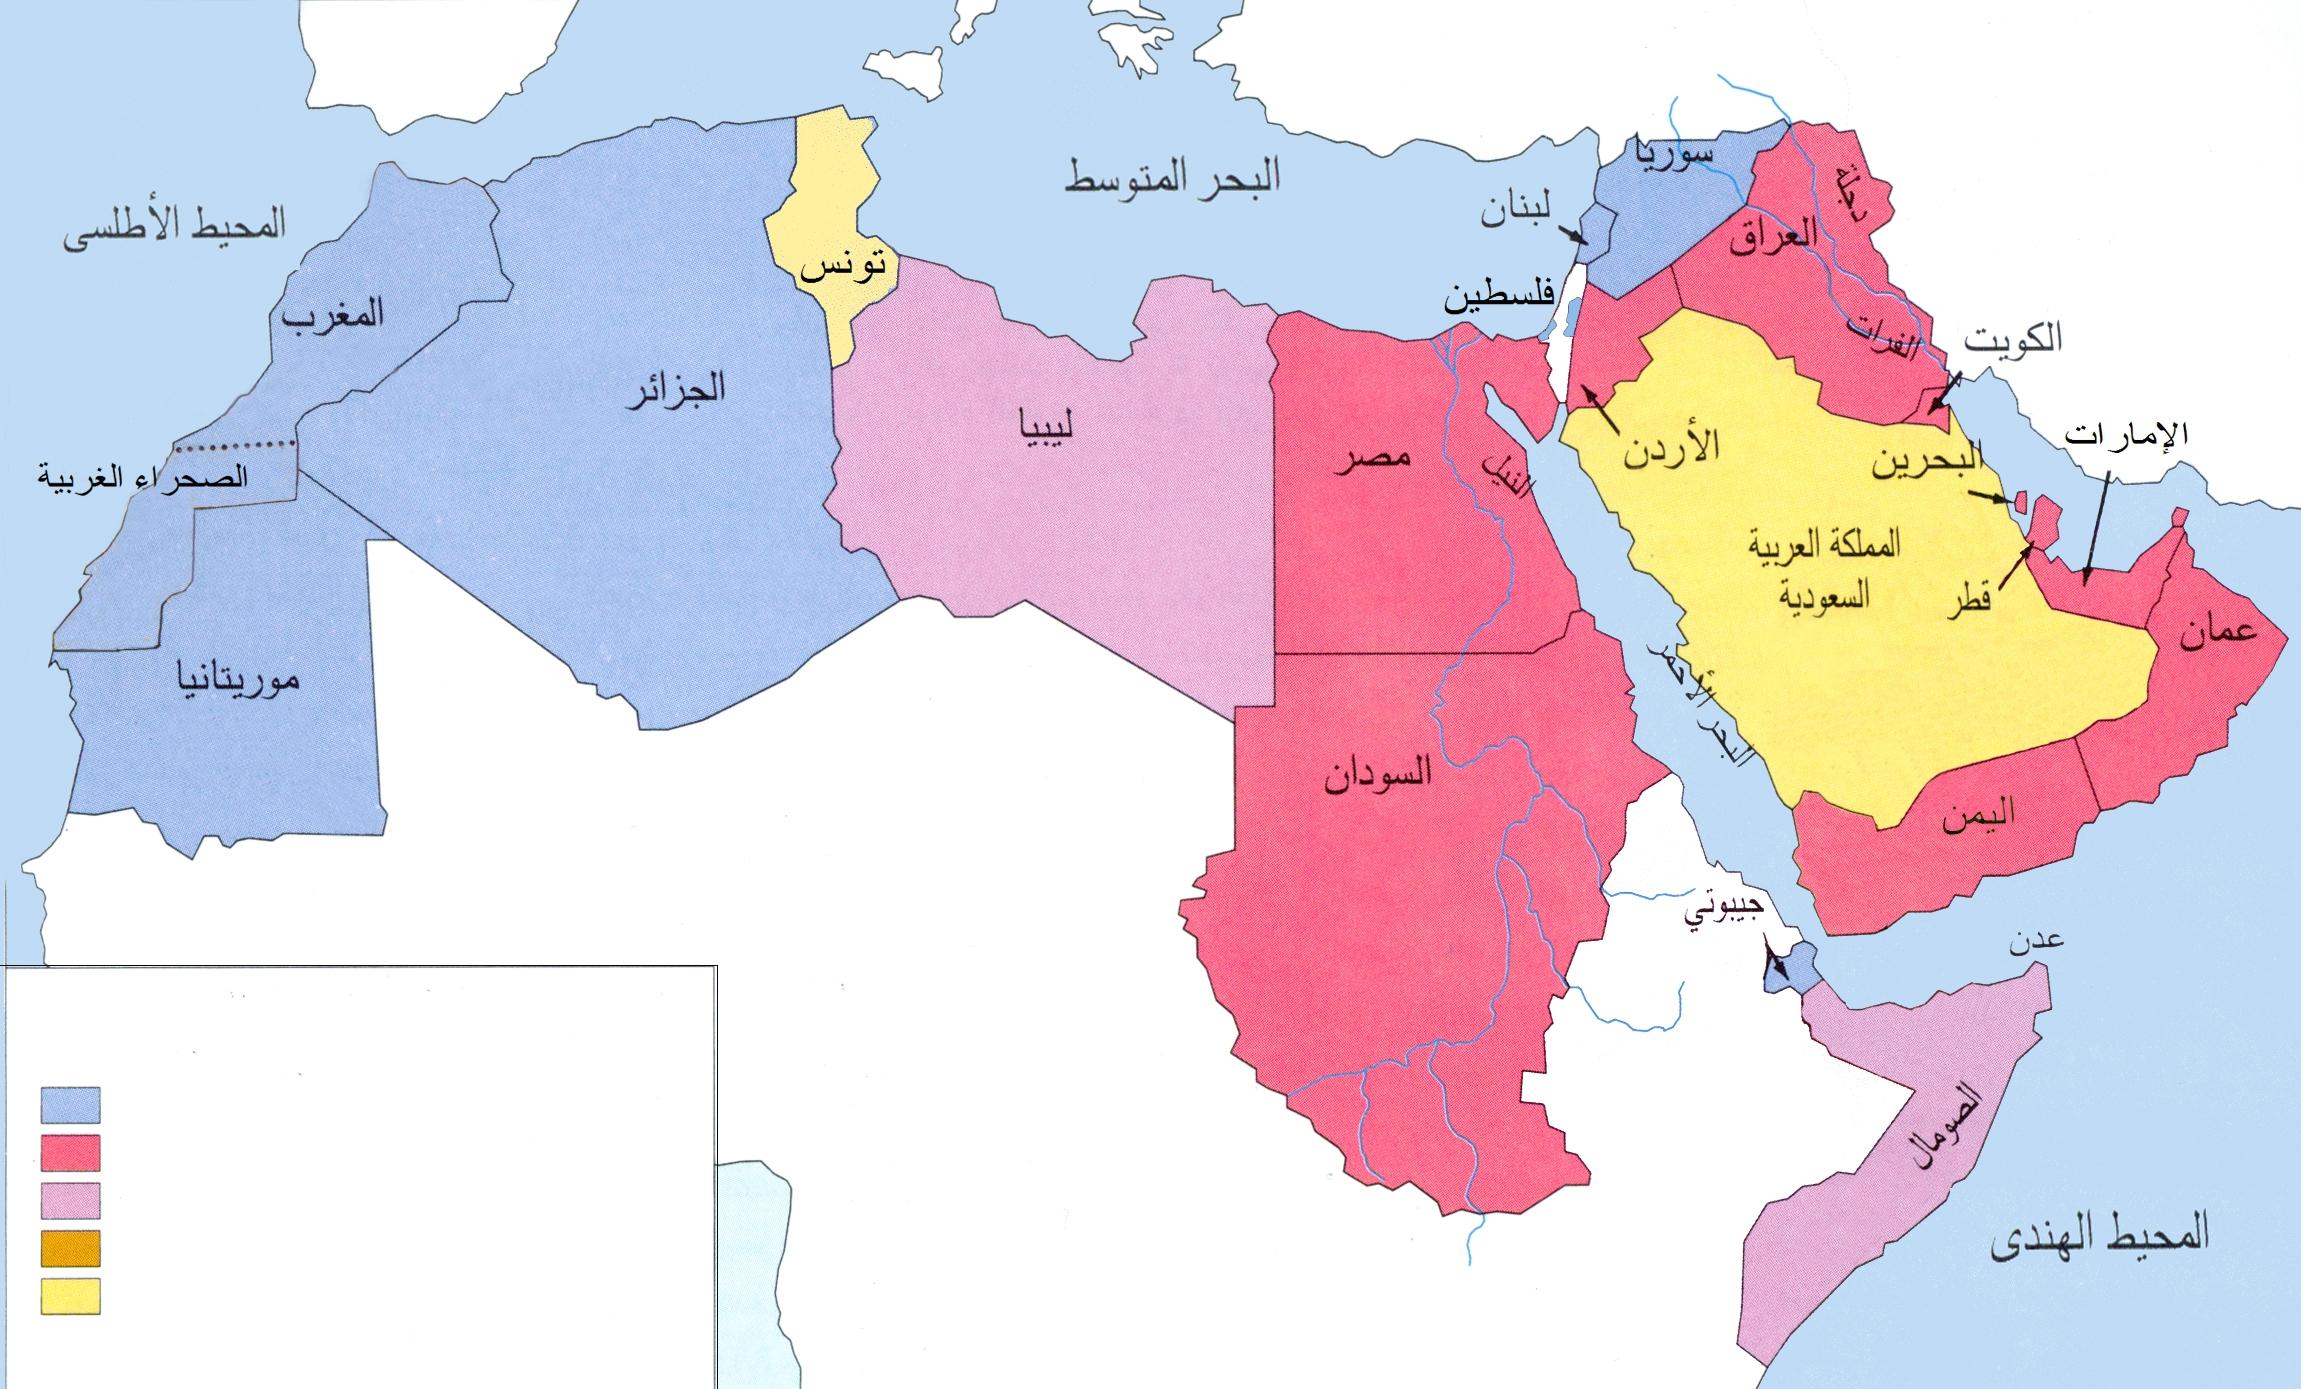 Arab world map